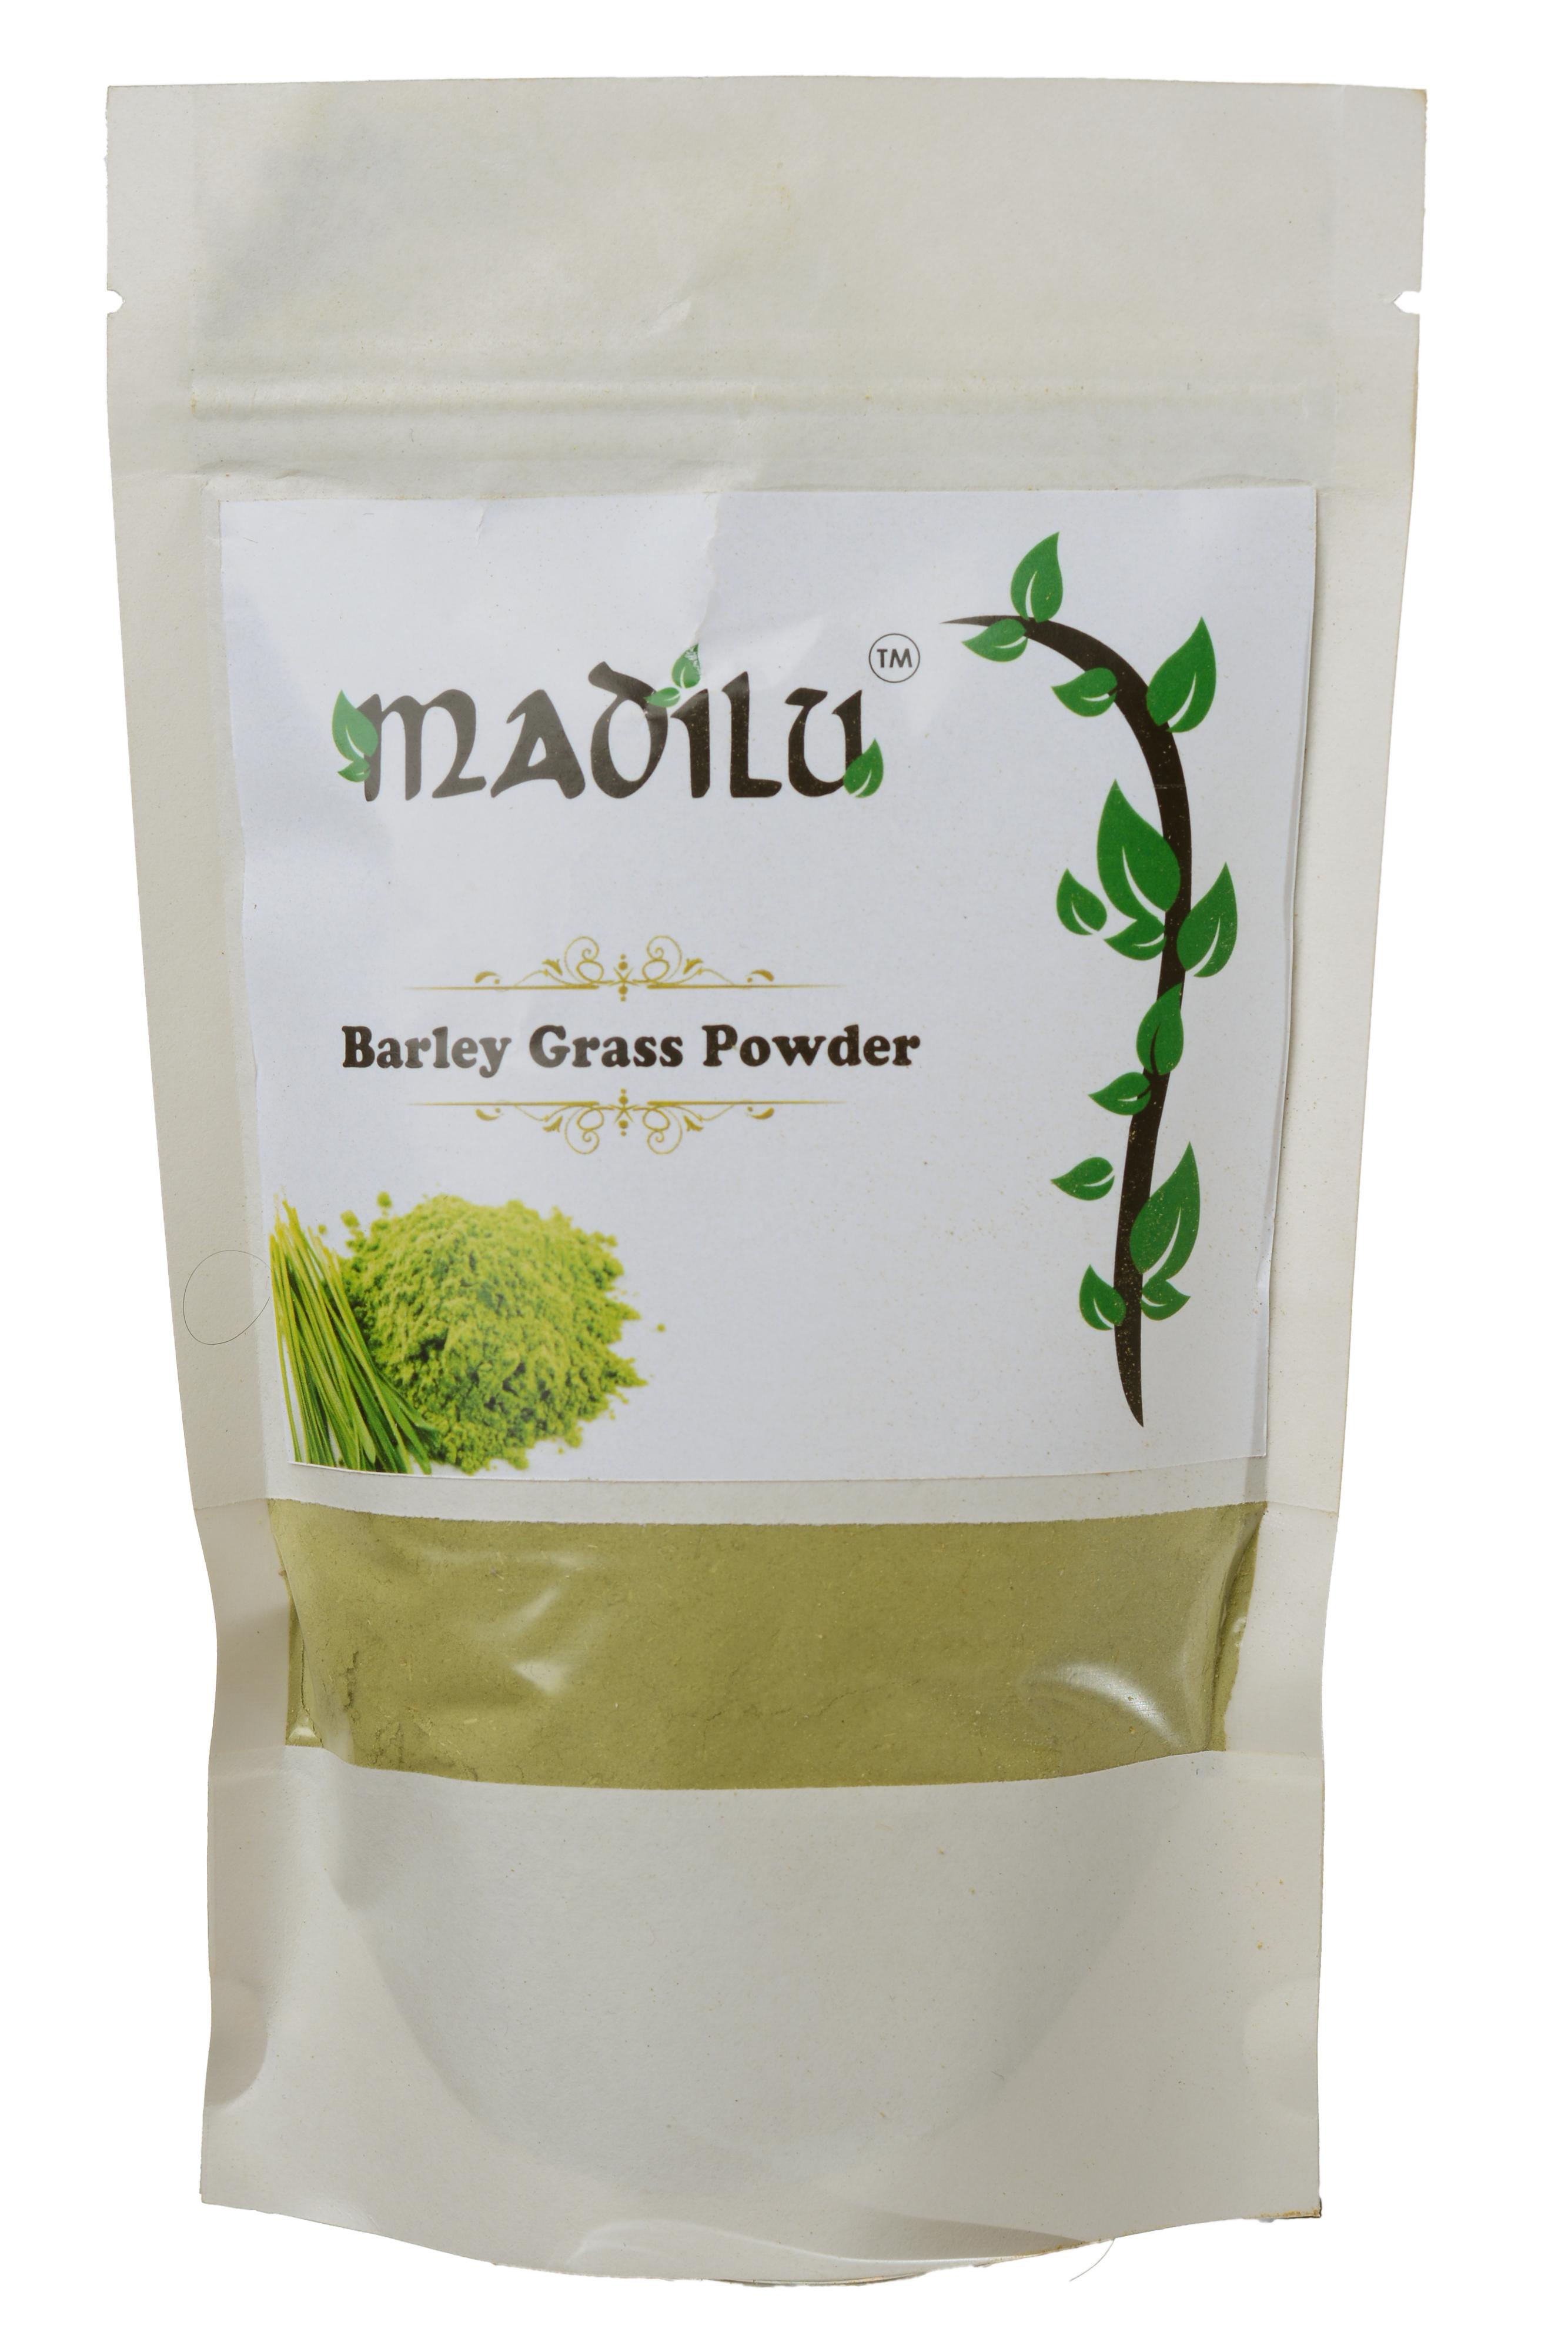 BARLEY GRASS POWDER BY MADILU